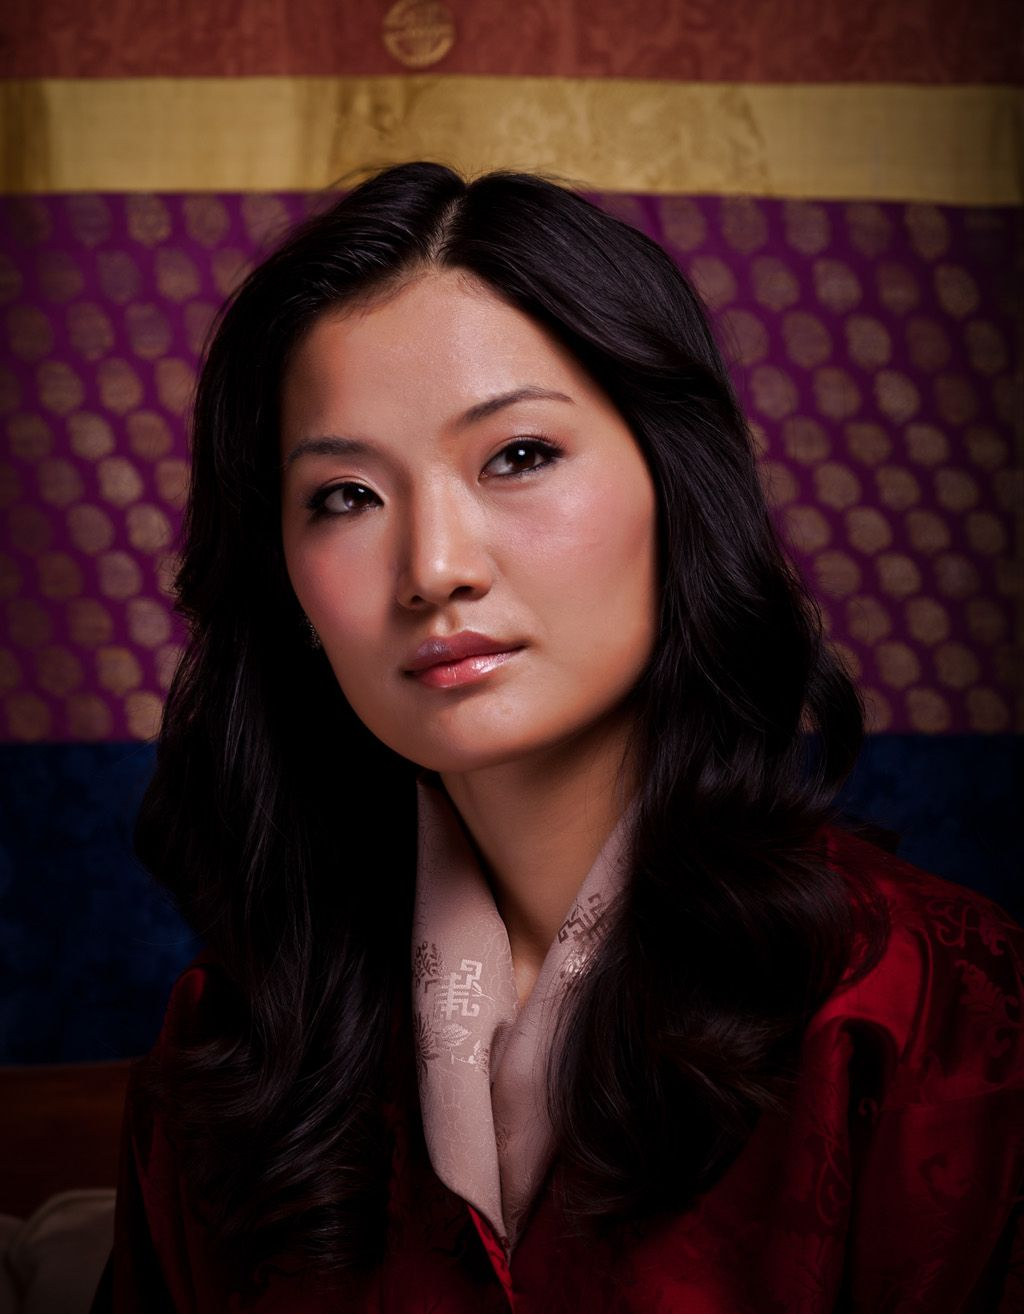 The Queen of Bhutan, Jetsun Pema SpouseJigme Khesar Namgyel Wangchuck Full nameJetsun Pema Wangchuckk HouseHouse of Wangchuck Father YAB Dhendup Gyaltshen MotherYUM Sonam Choki Born 4 June 1990(age22) inThimphu, Bhutan ReligionBuddhism